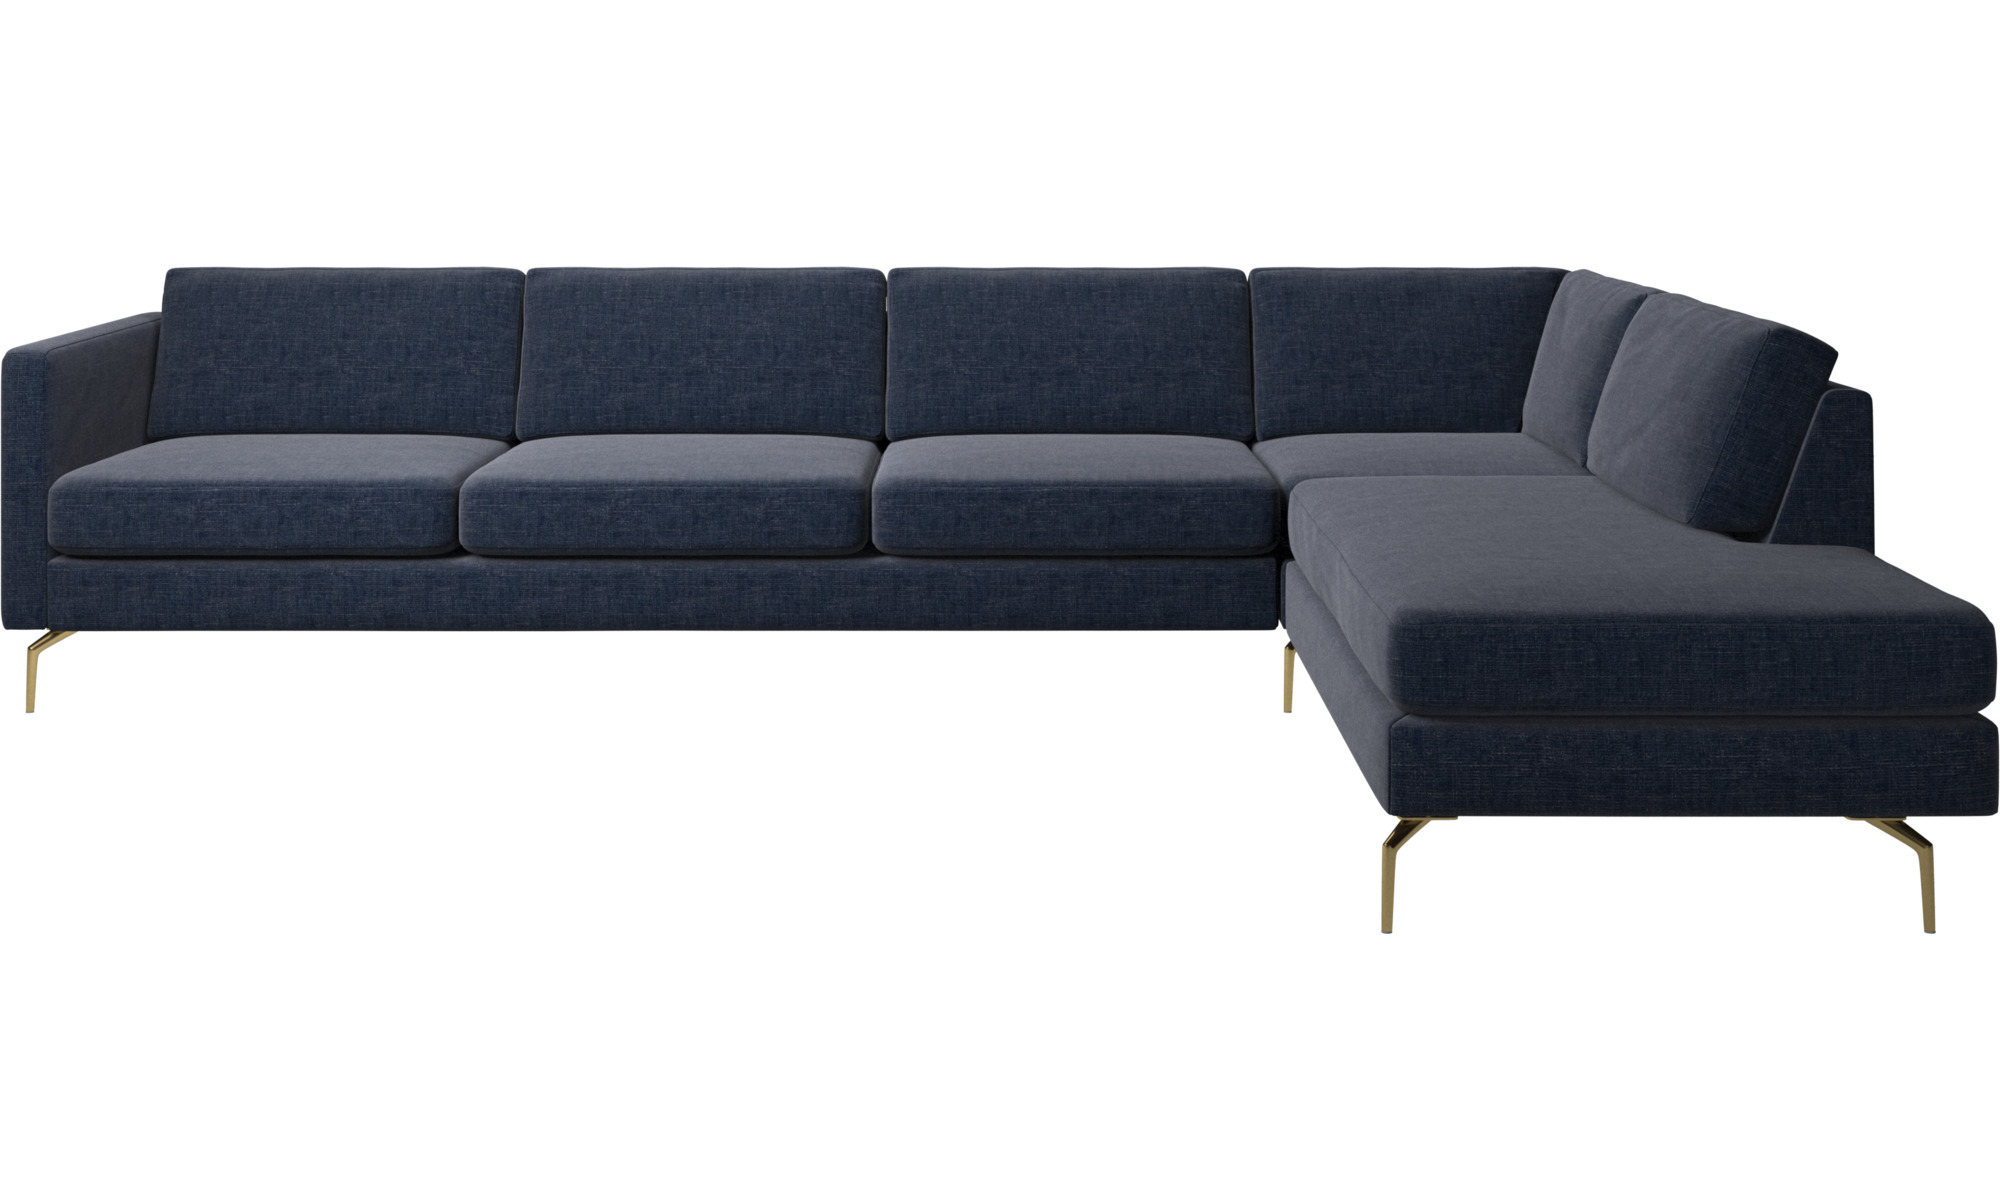 Corner sofas - Osaka corner sofa with lounging unit, regular seat - Blue - Fabric